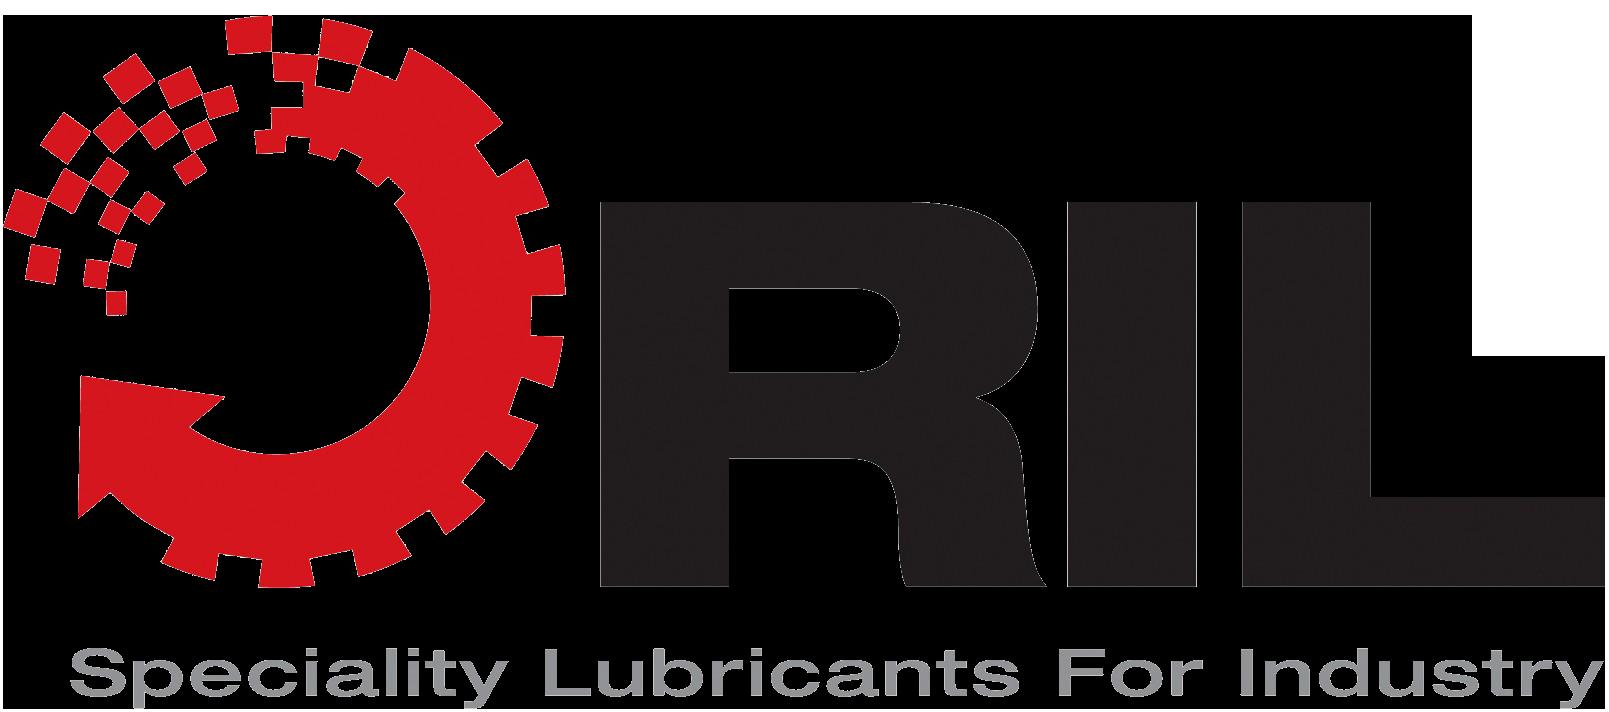 Ril lubricants . Gear clipart lubrication